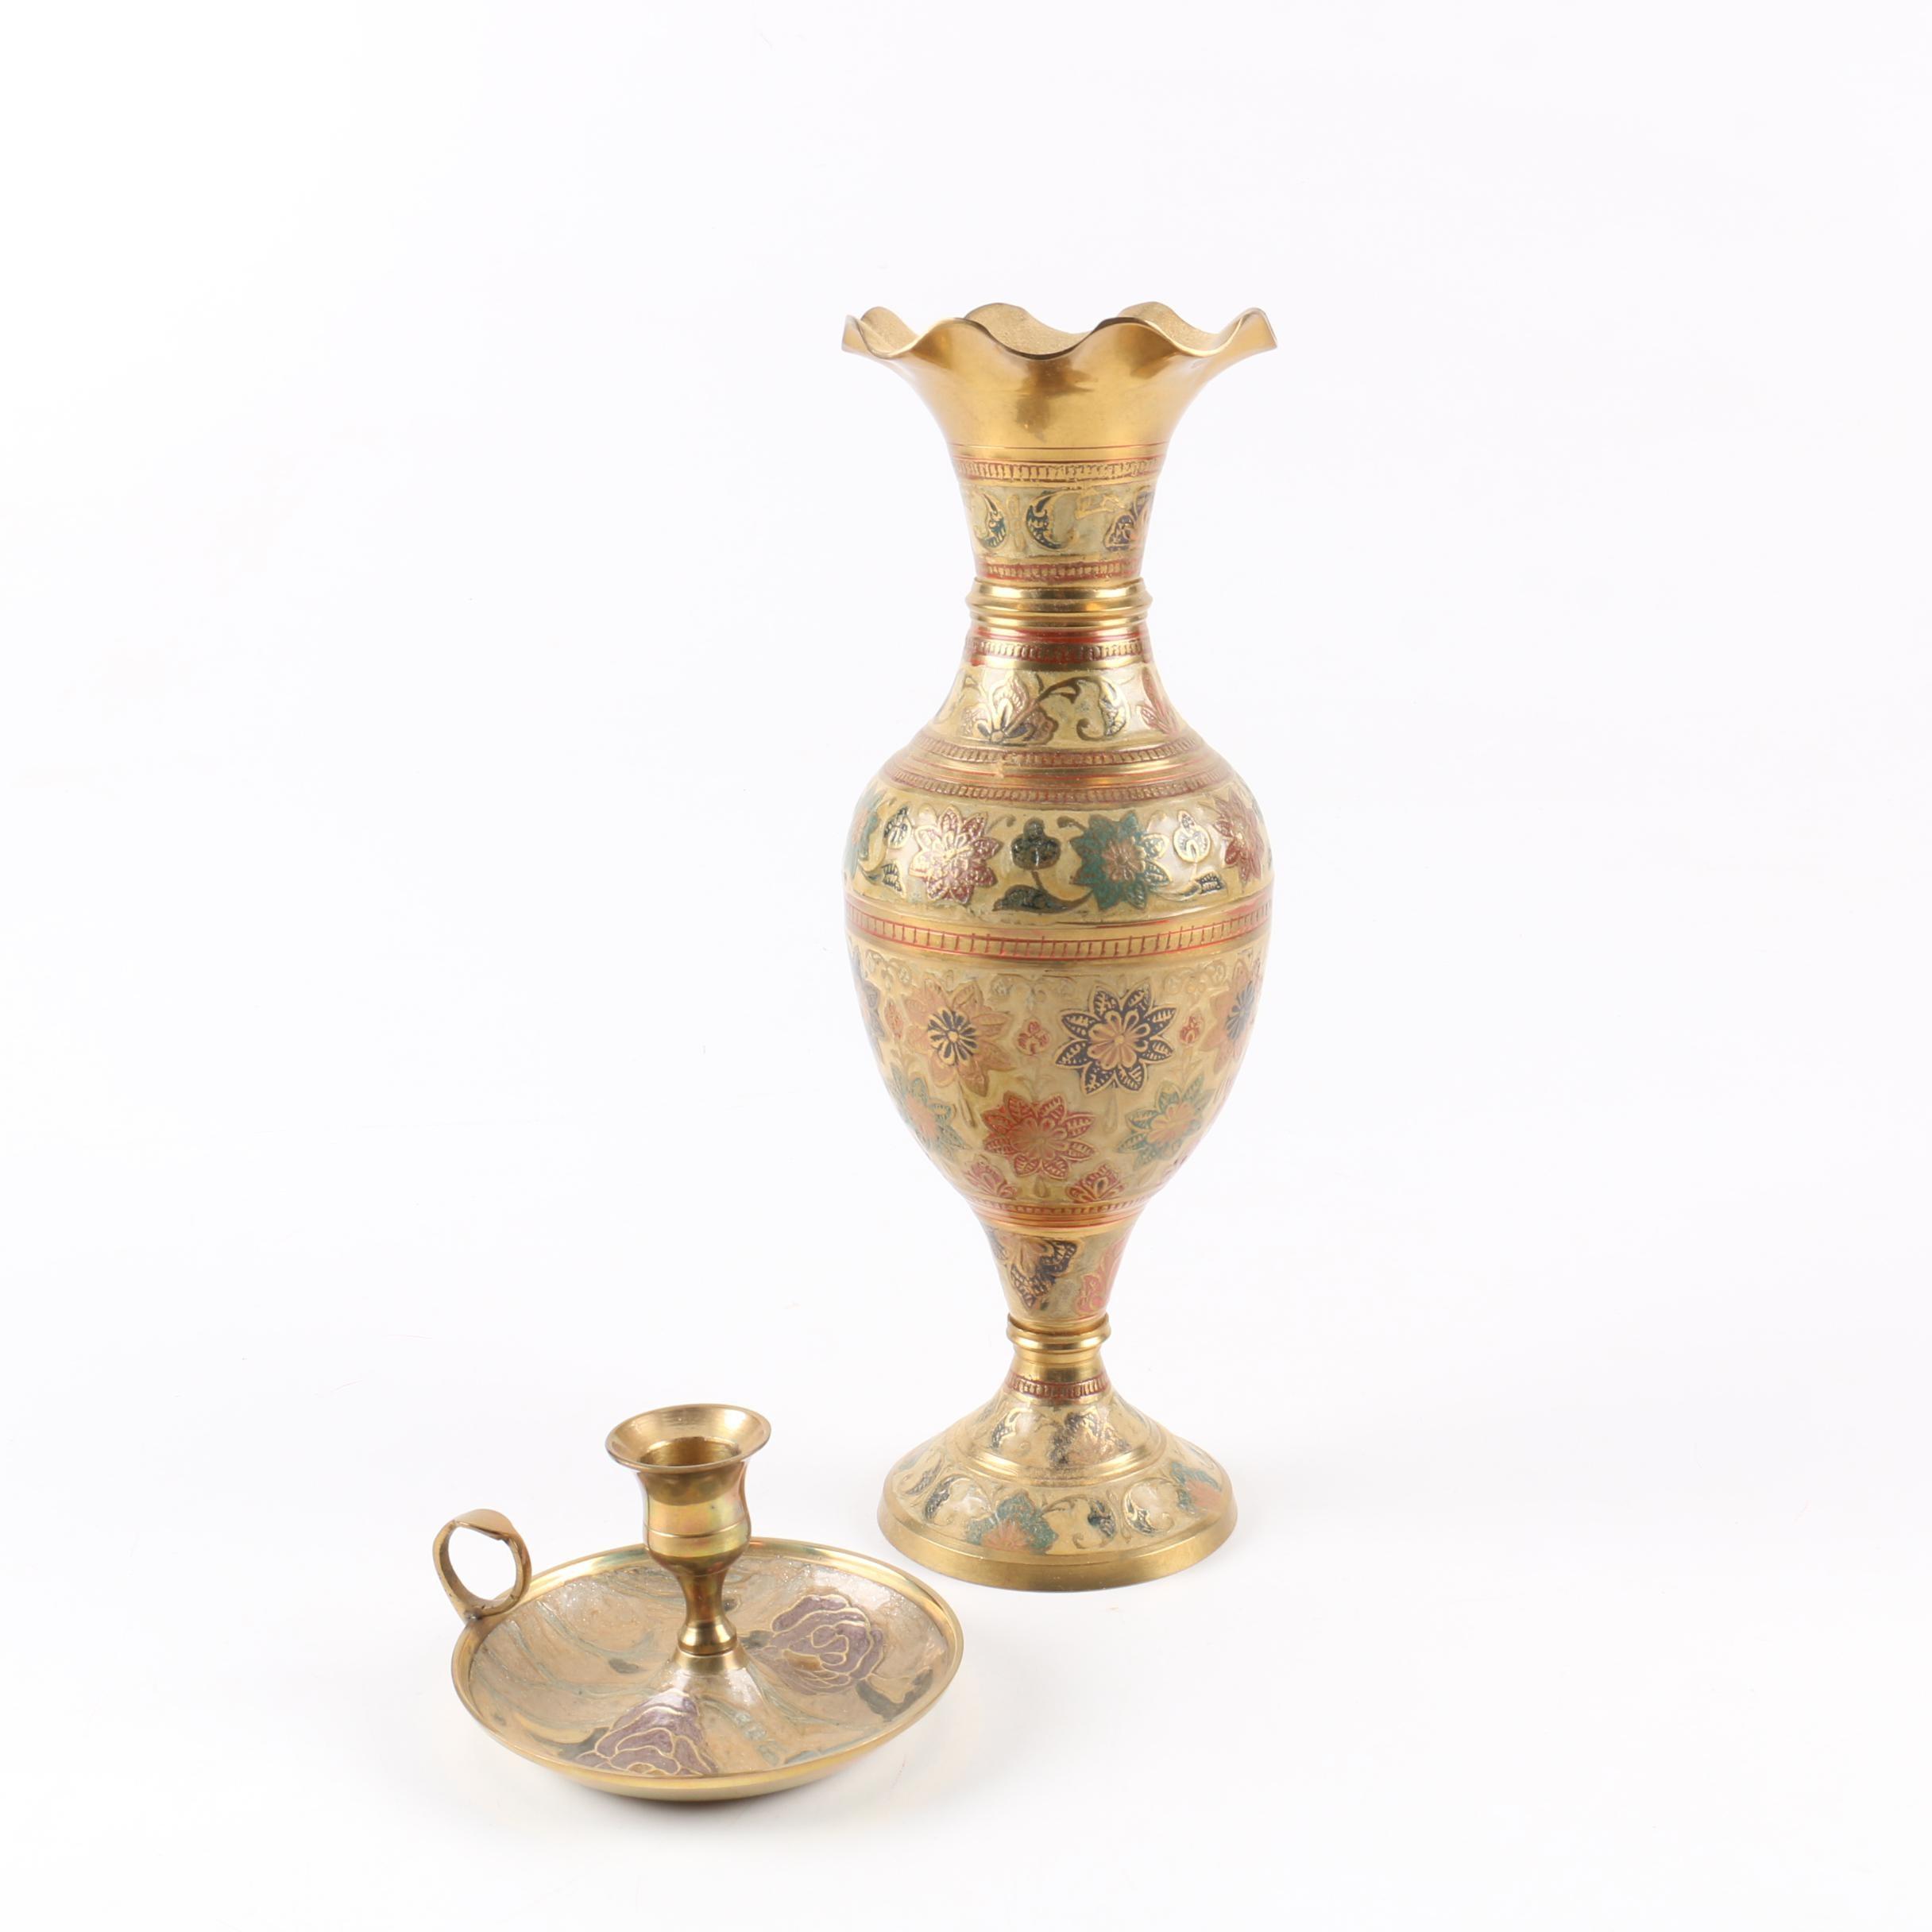 Indian Enameled Brass Vase and Candle Holder